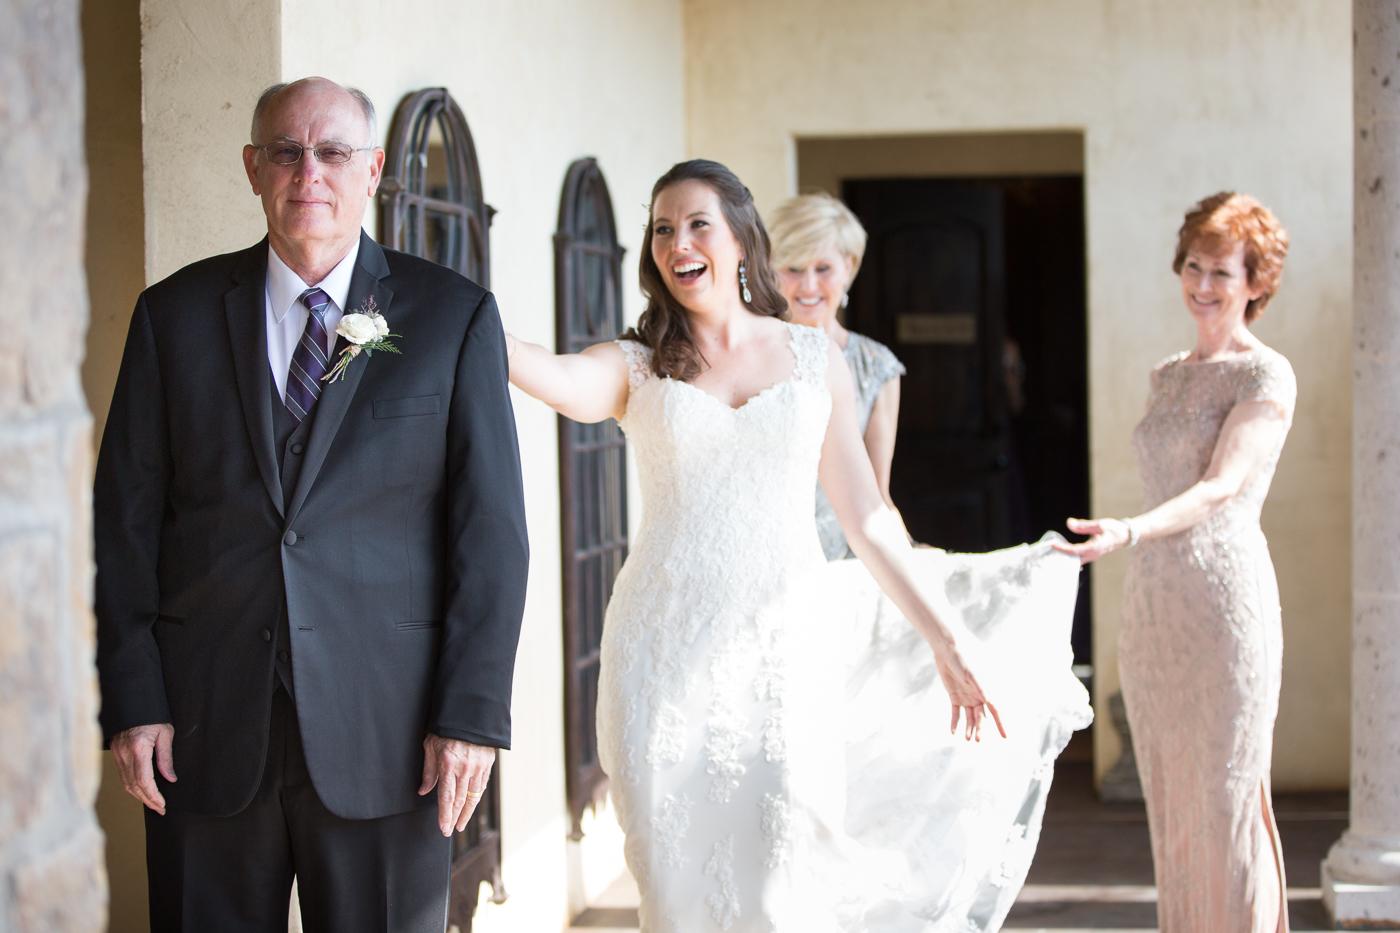 Austin-wedding-photo-and-video-008.jpg